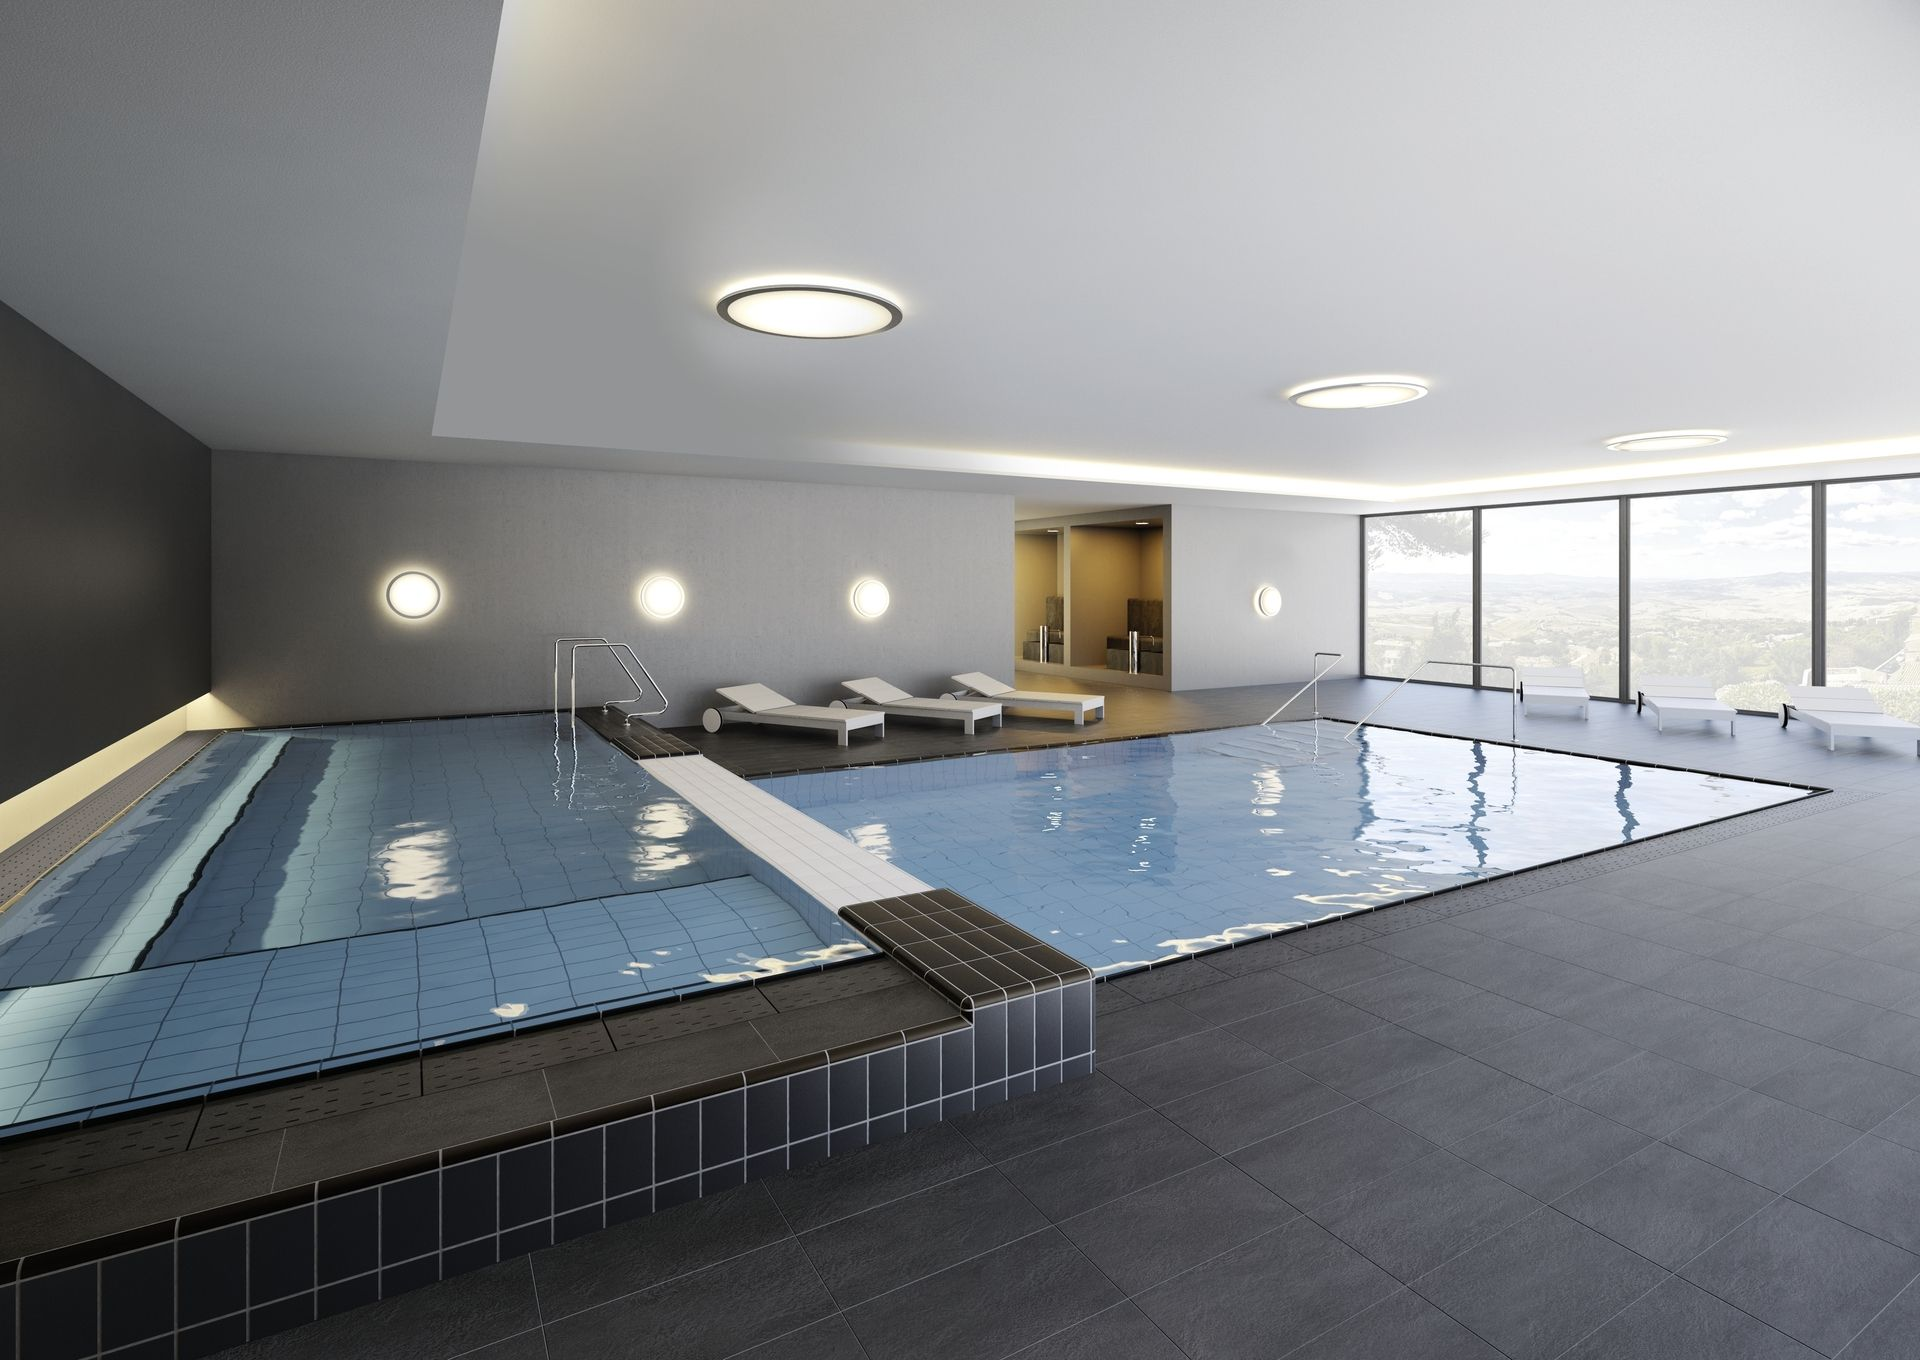 schwimmbadkeramik chroma pool b derspezialprogramm beckenkopfsysteme ais. Black Bedroom Furniture Sets. Home Design Ideas